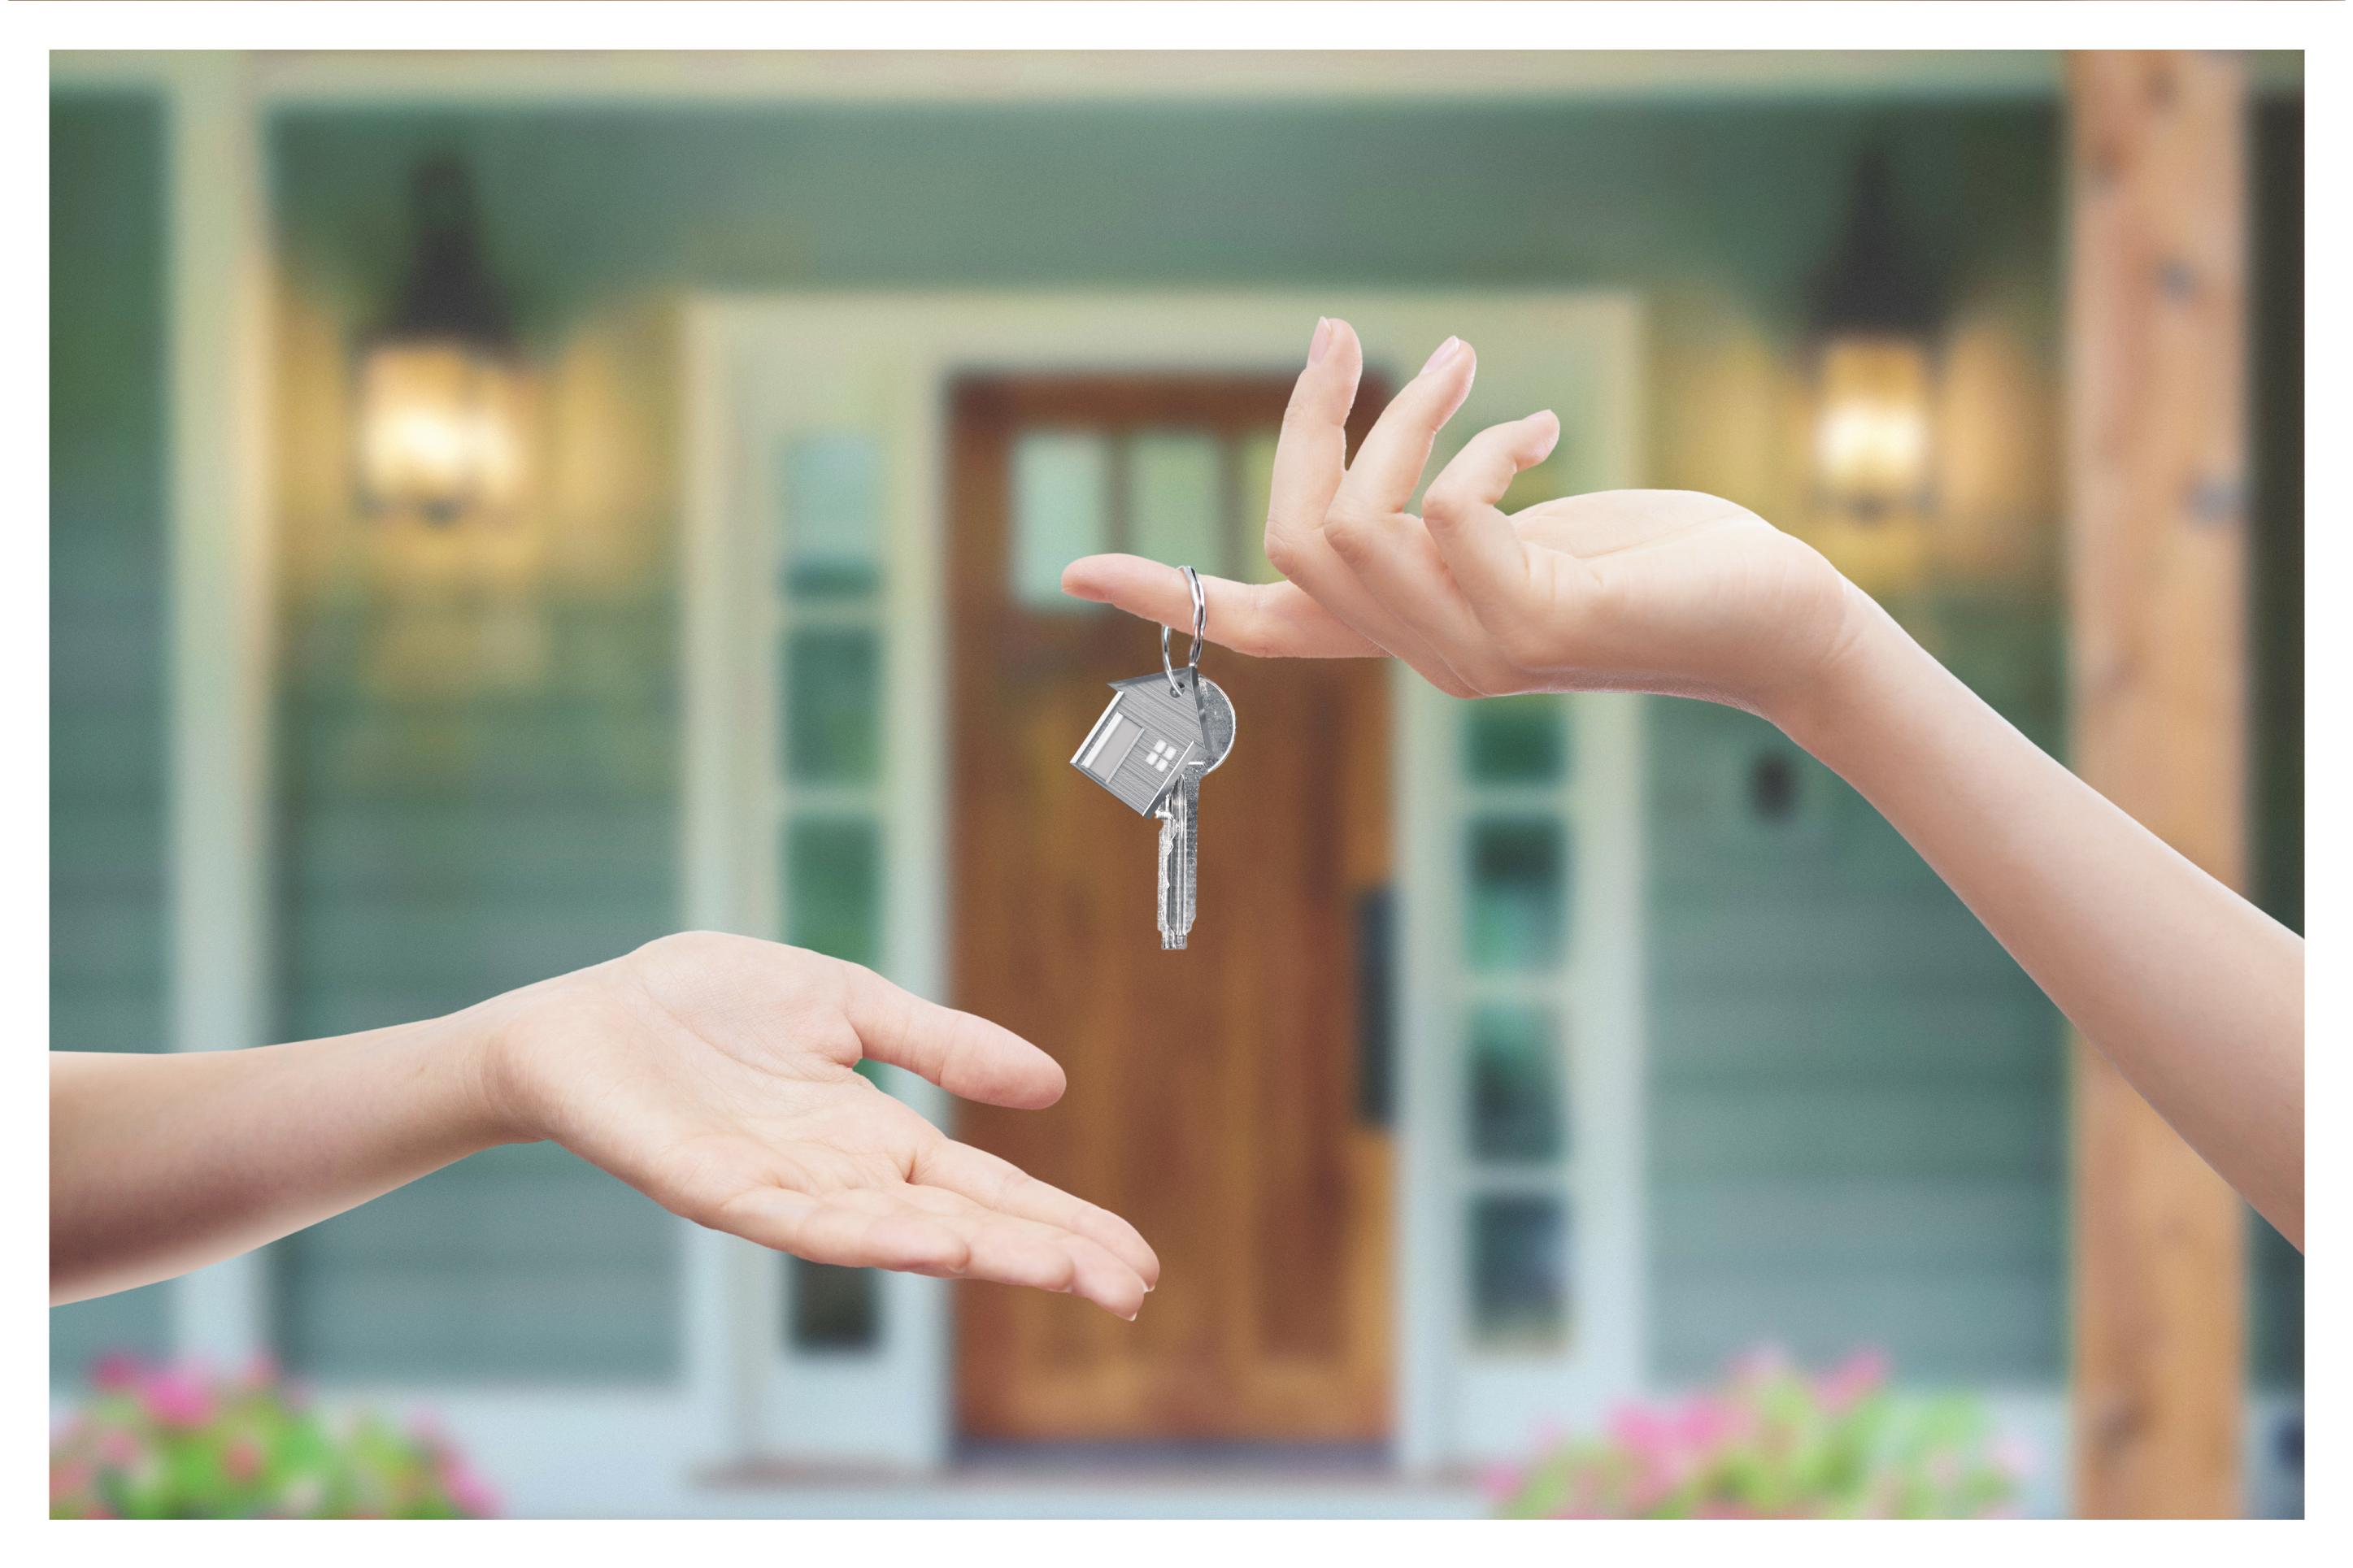 RMCU_HomeEquity_Blog_Images-2